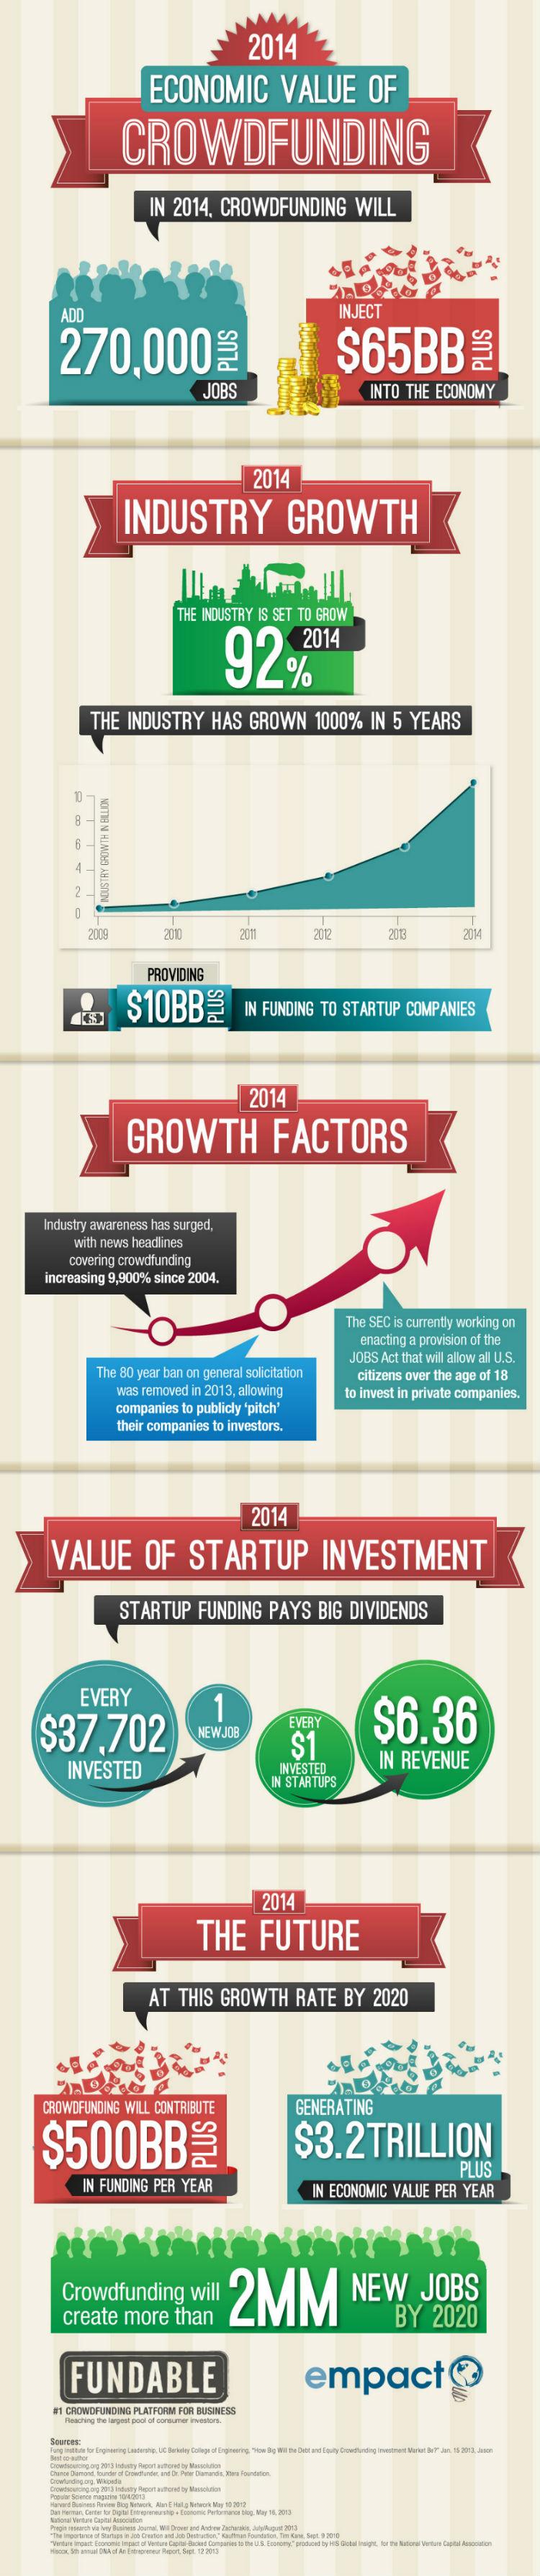 The Economic Benefits of Crowdfunding